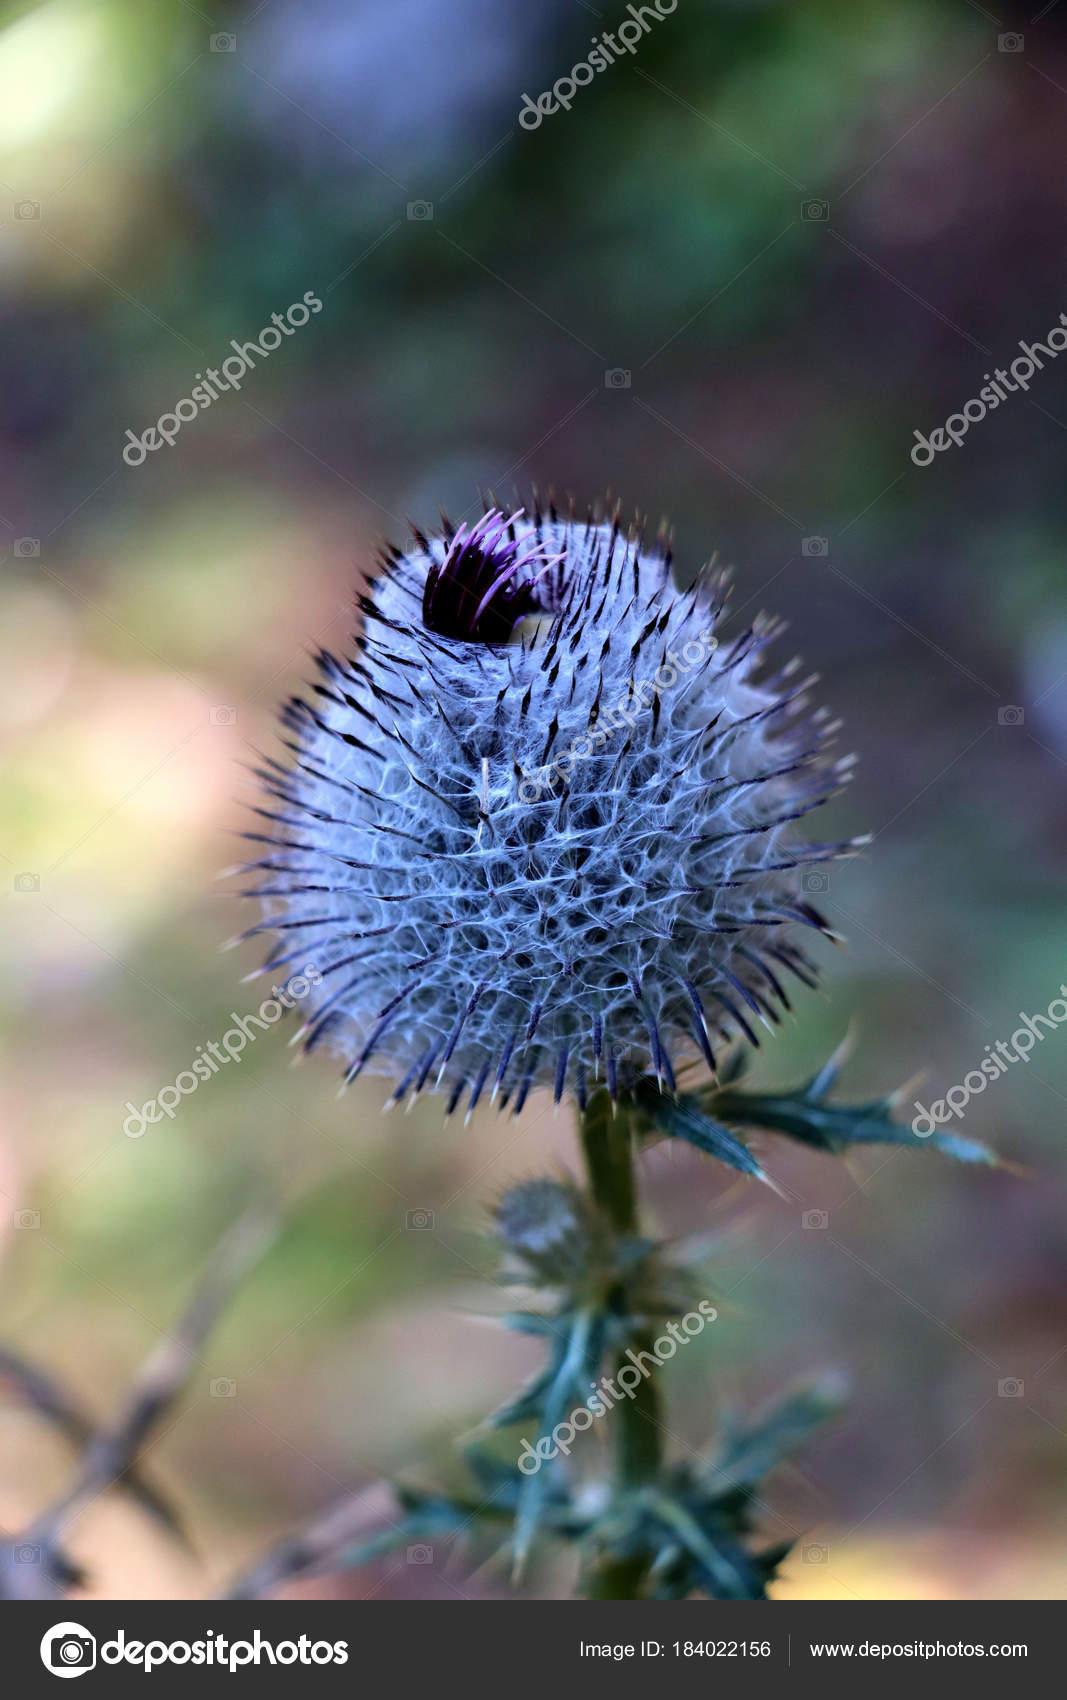 Thistle blue flower small thorns stock photo cowii 184022156 thistle blue flower small thorns stock photo izmirmasajfo